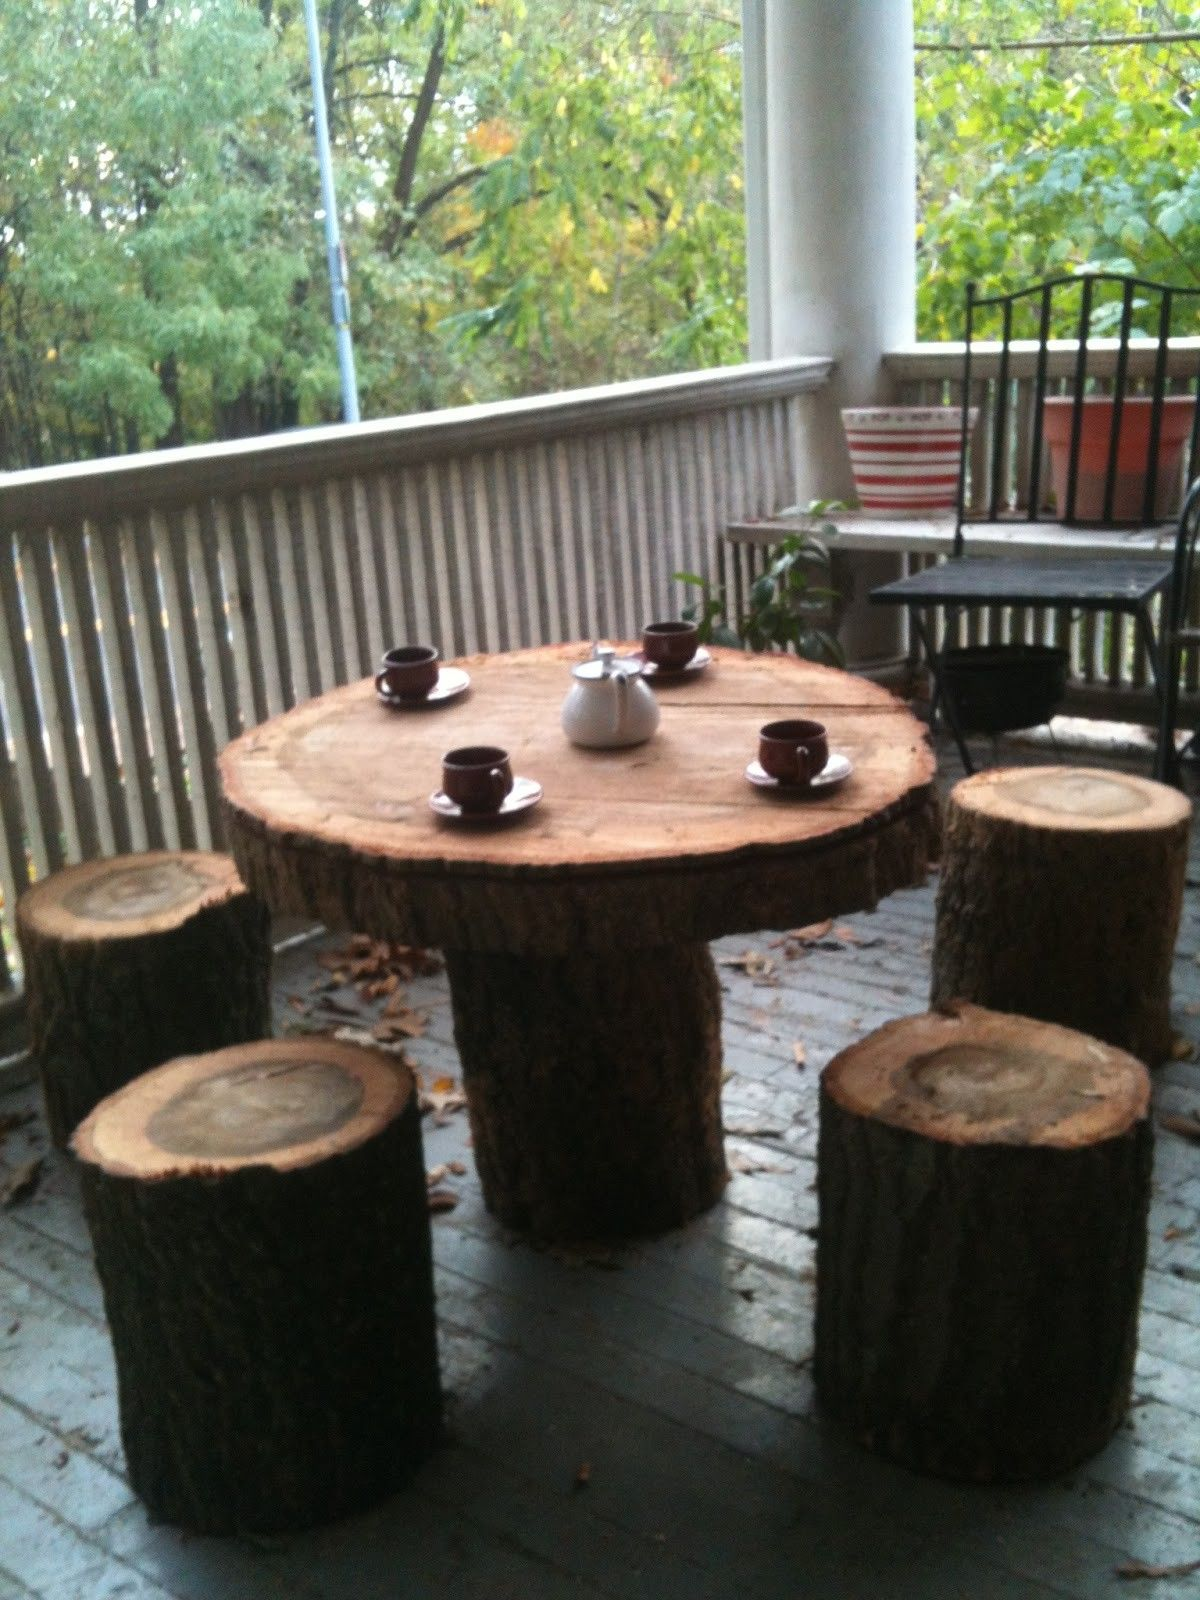 Diy Tree Stump Table - Rustic round wood coffee table google search tree stump